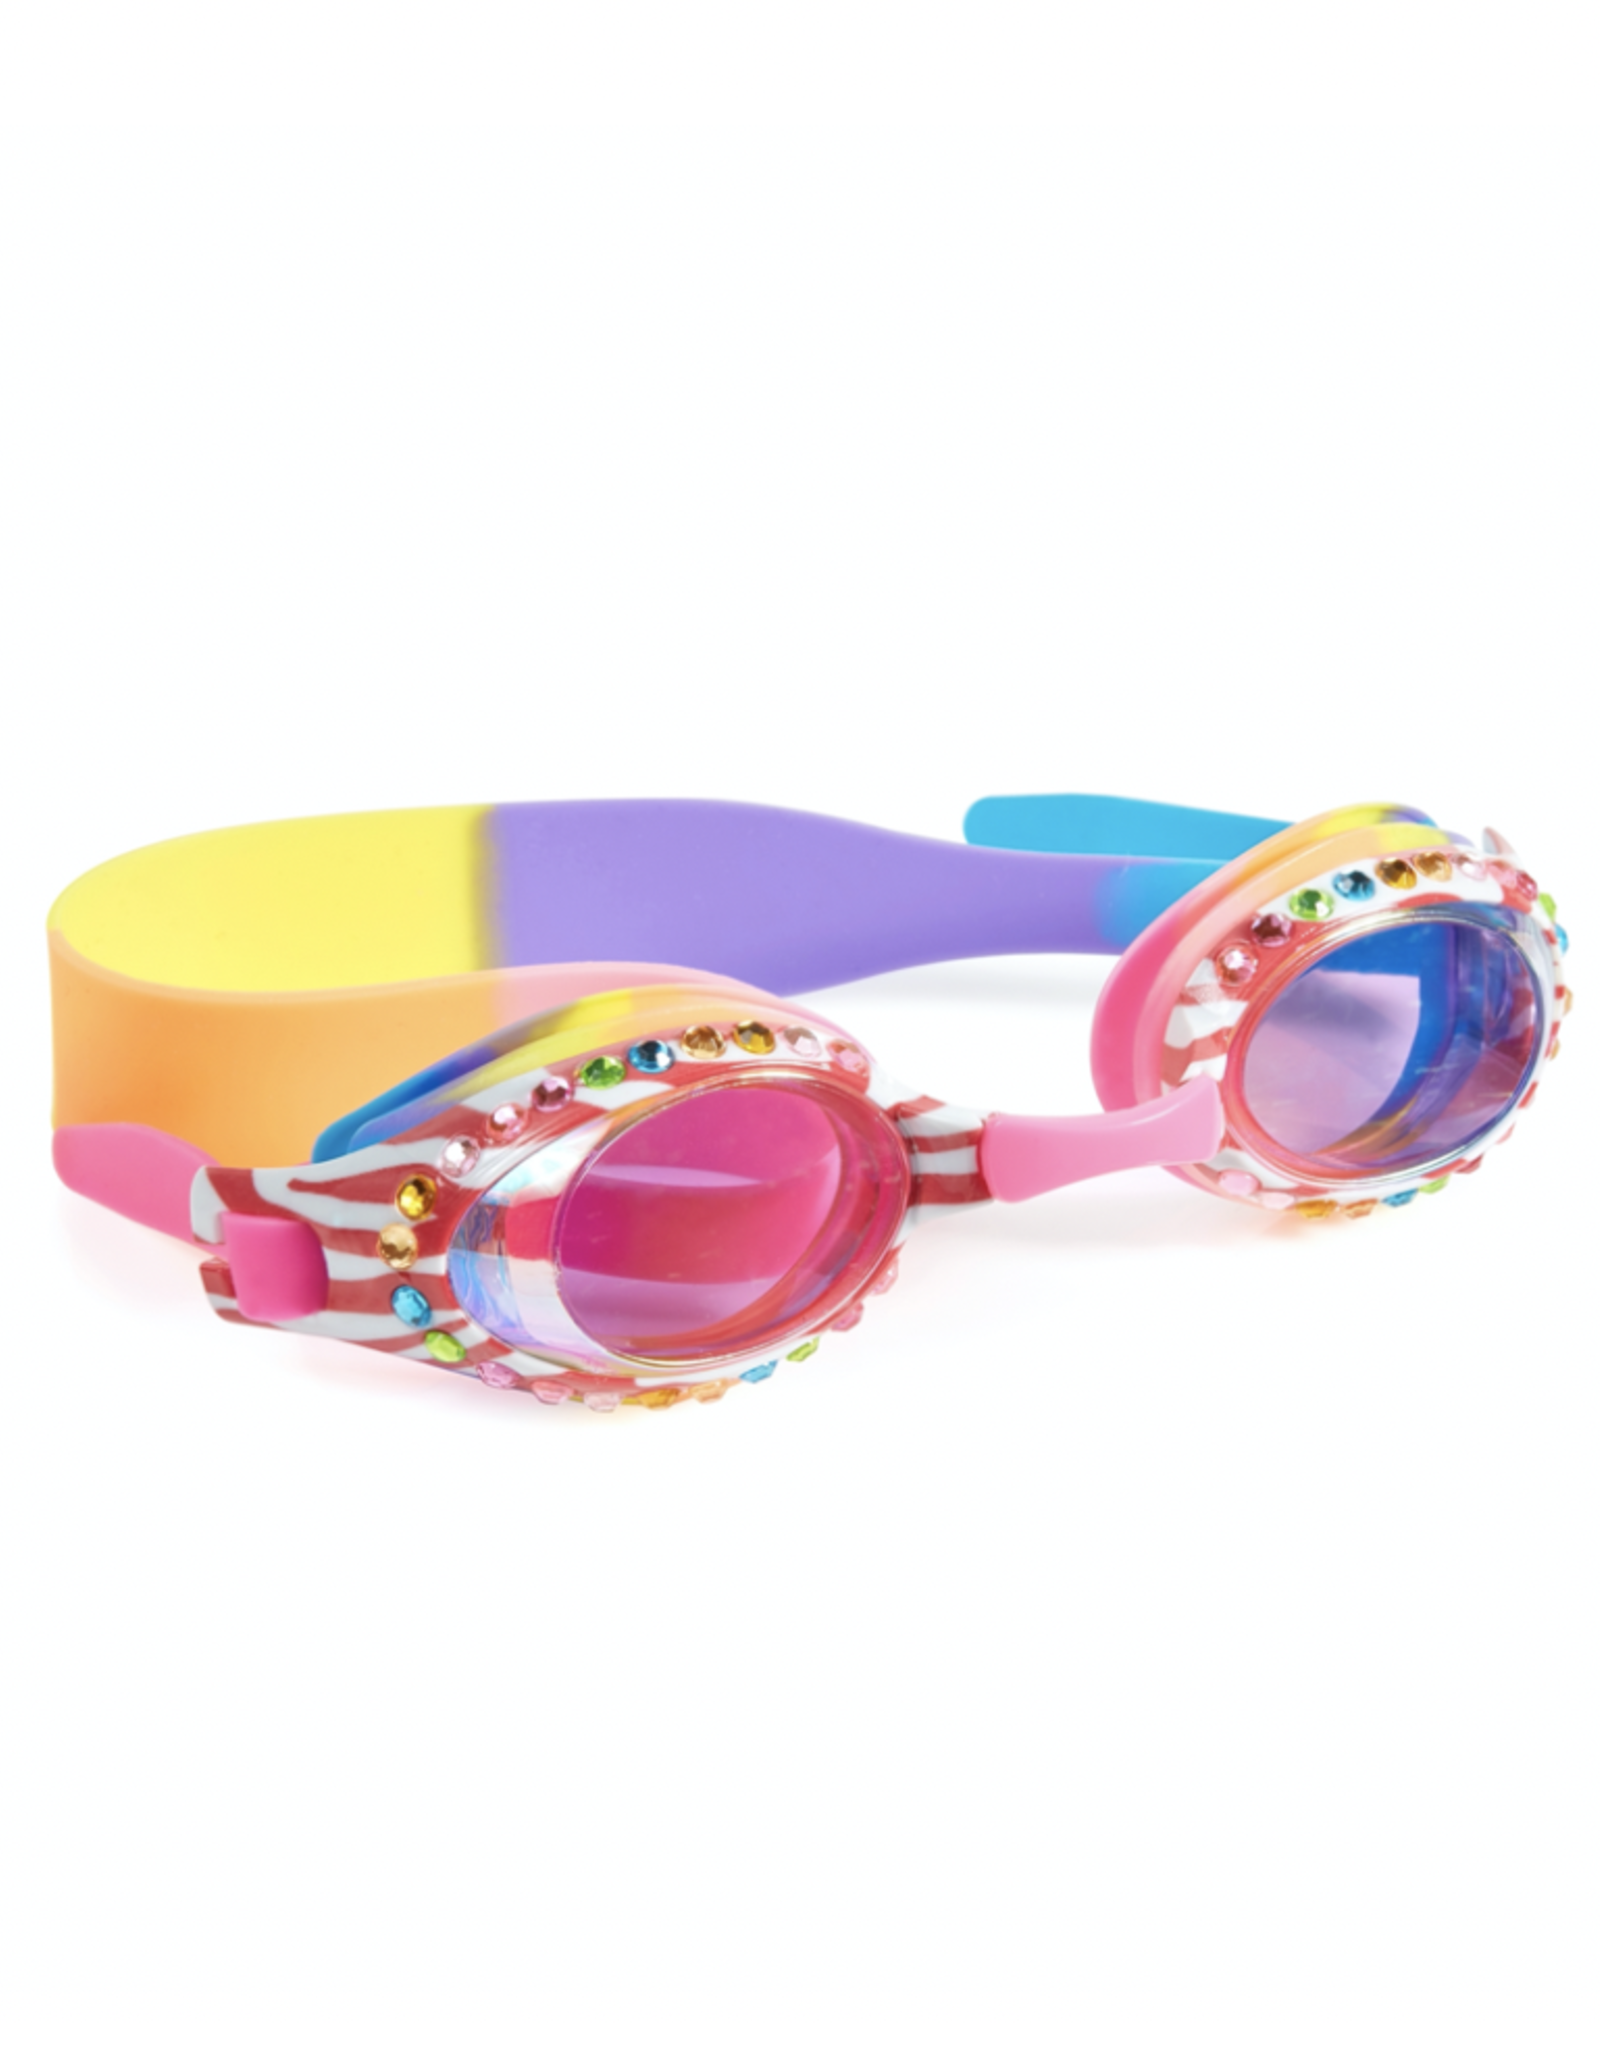 Bling2o Bling2o Goggles - Zebra Fruit Loop Pink